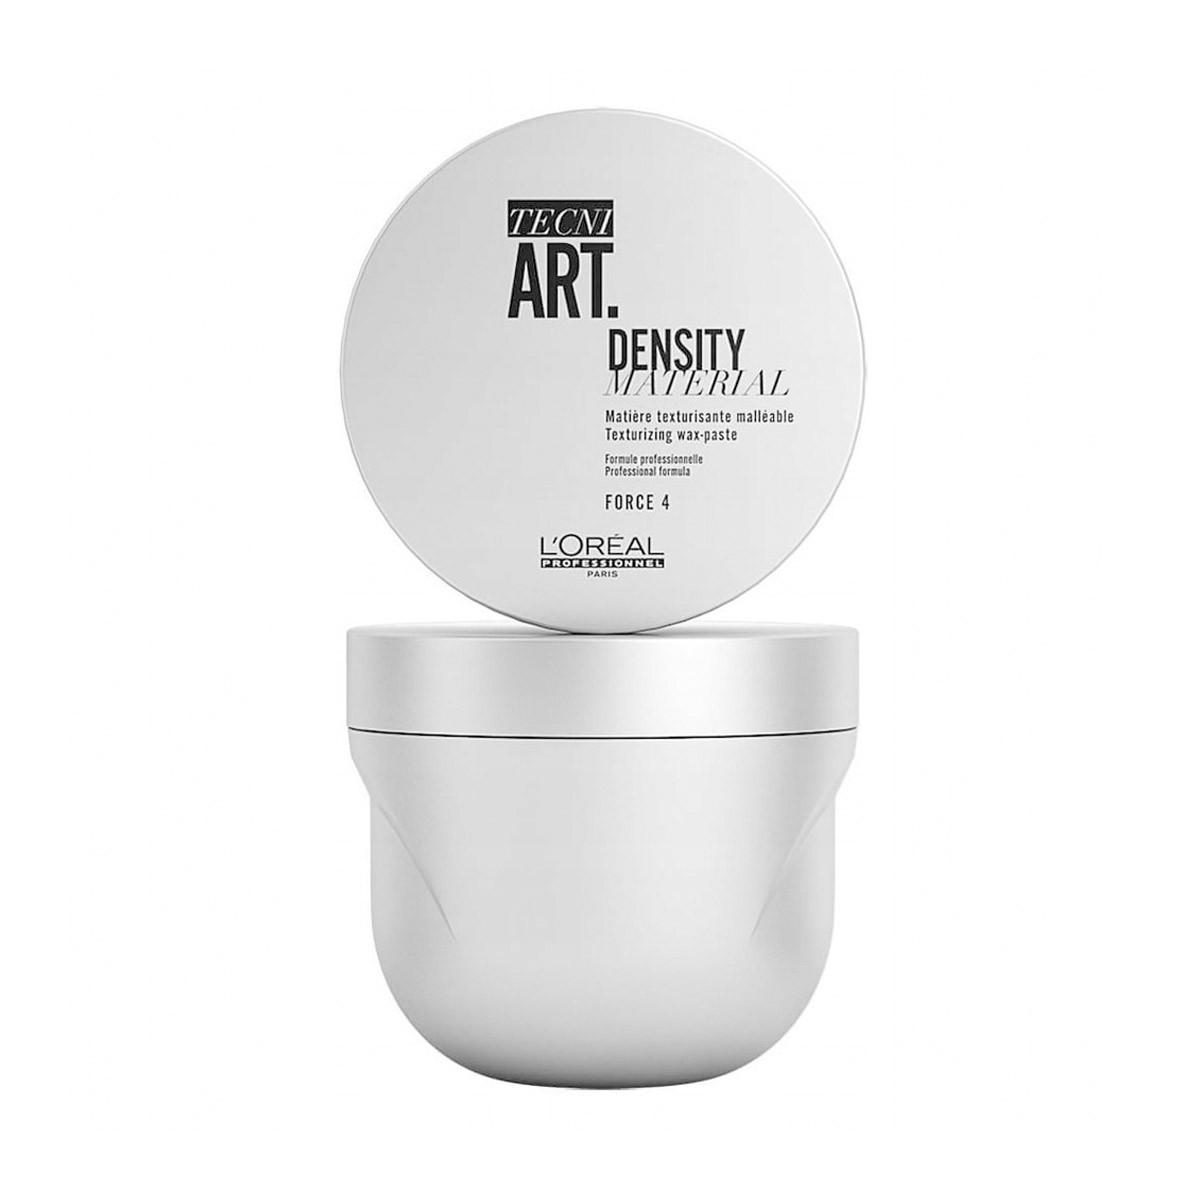 LOREAL Tecni Art Play Ball Density Material 100ml - Wosk-pasta teksturyzująca